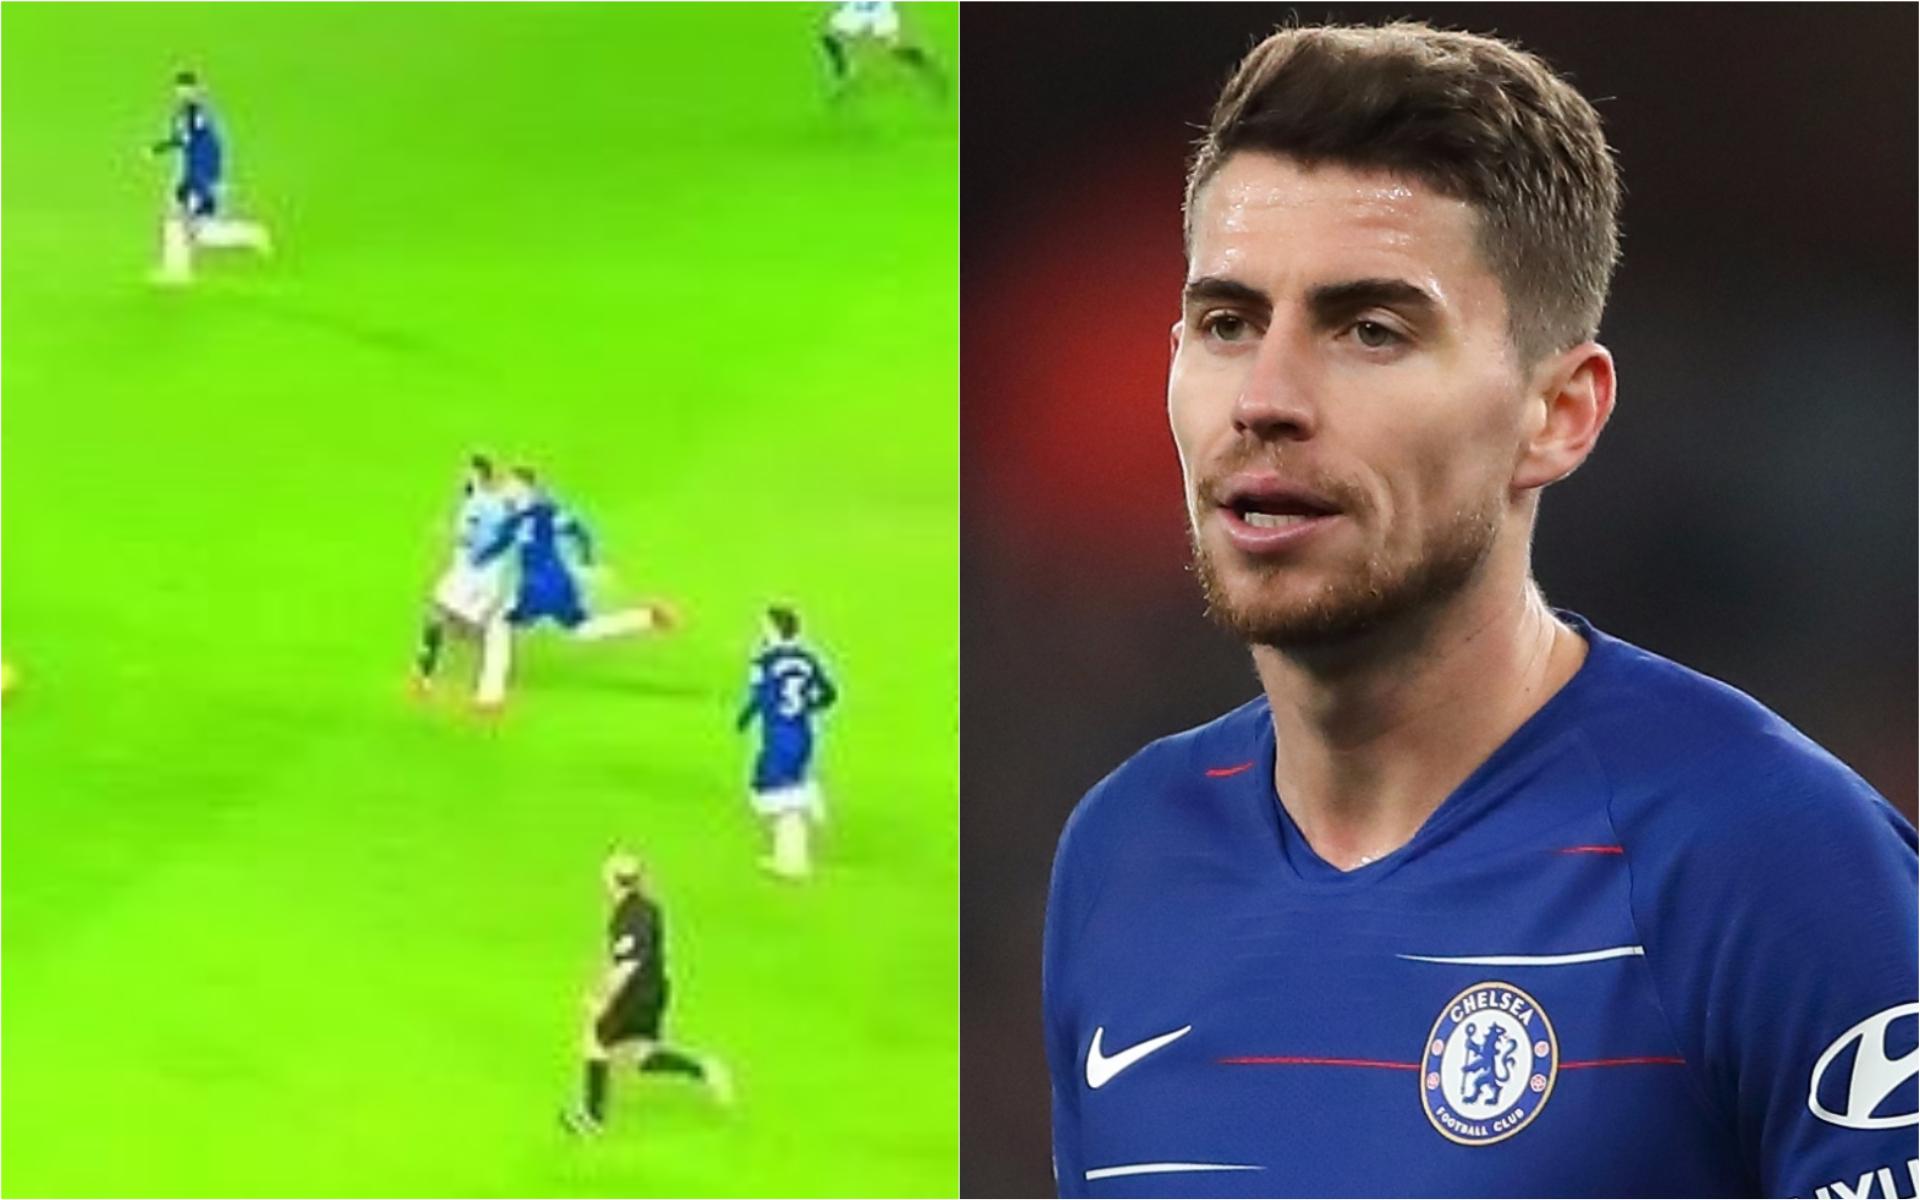 Jorginho shows shocking lack of effort during Chelsea's defeat to Man City